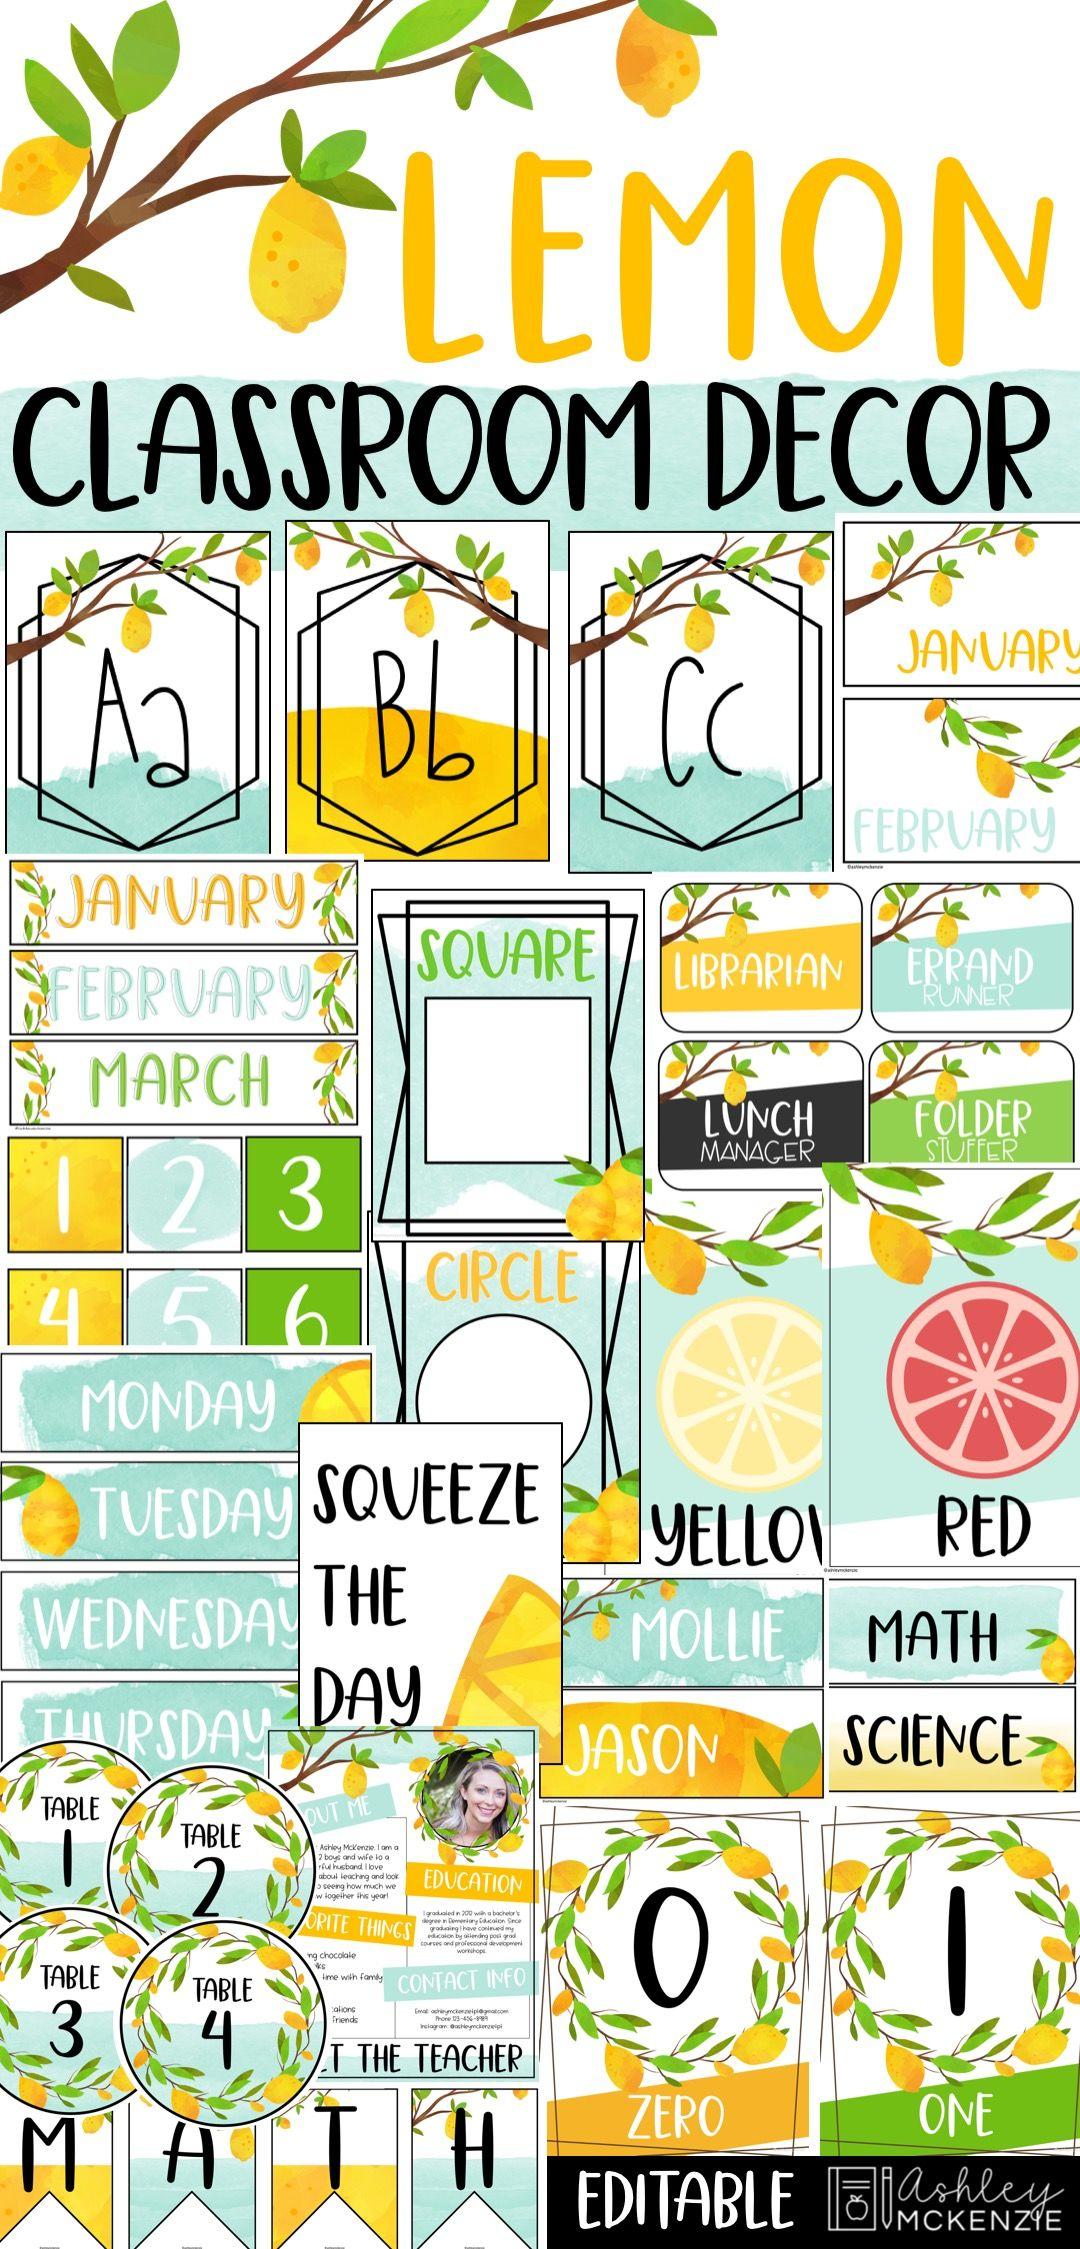 Lemon Classroom Decor #classroomdecor